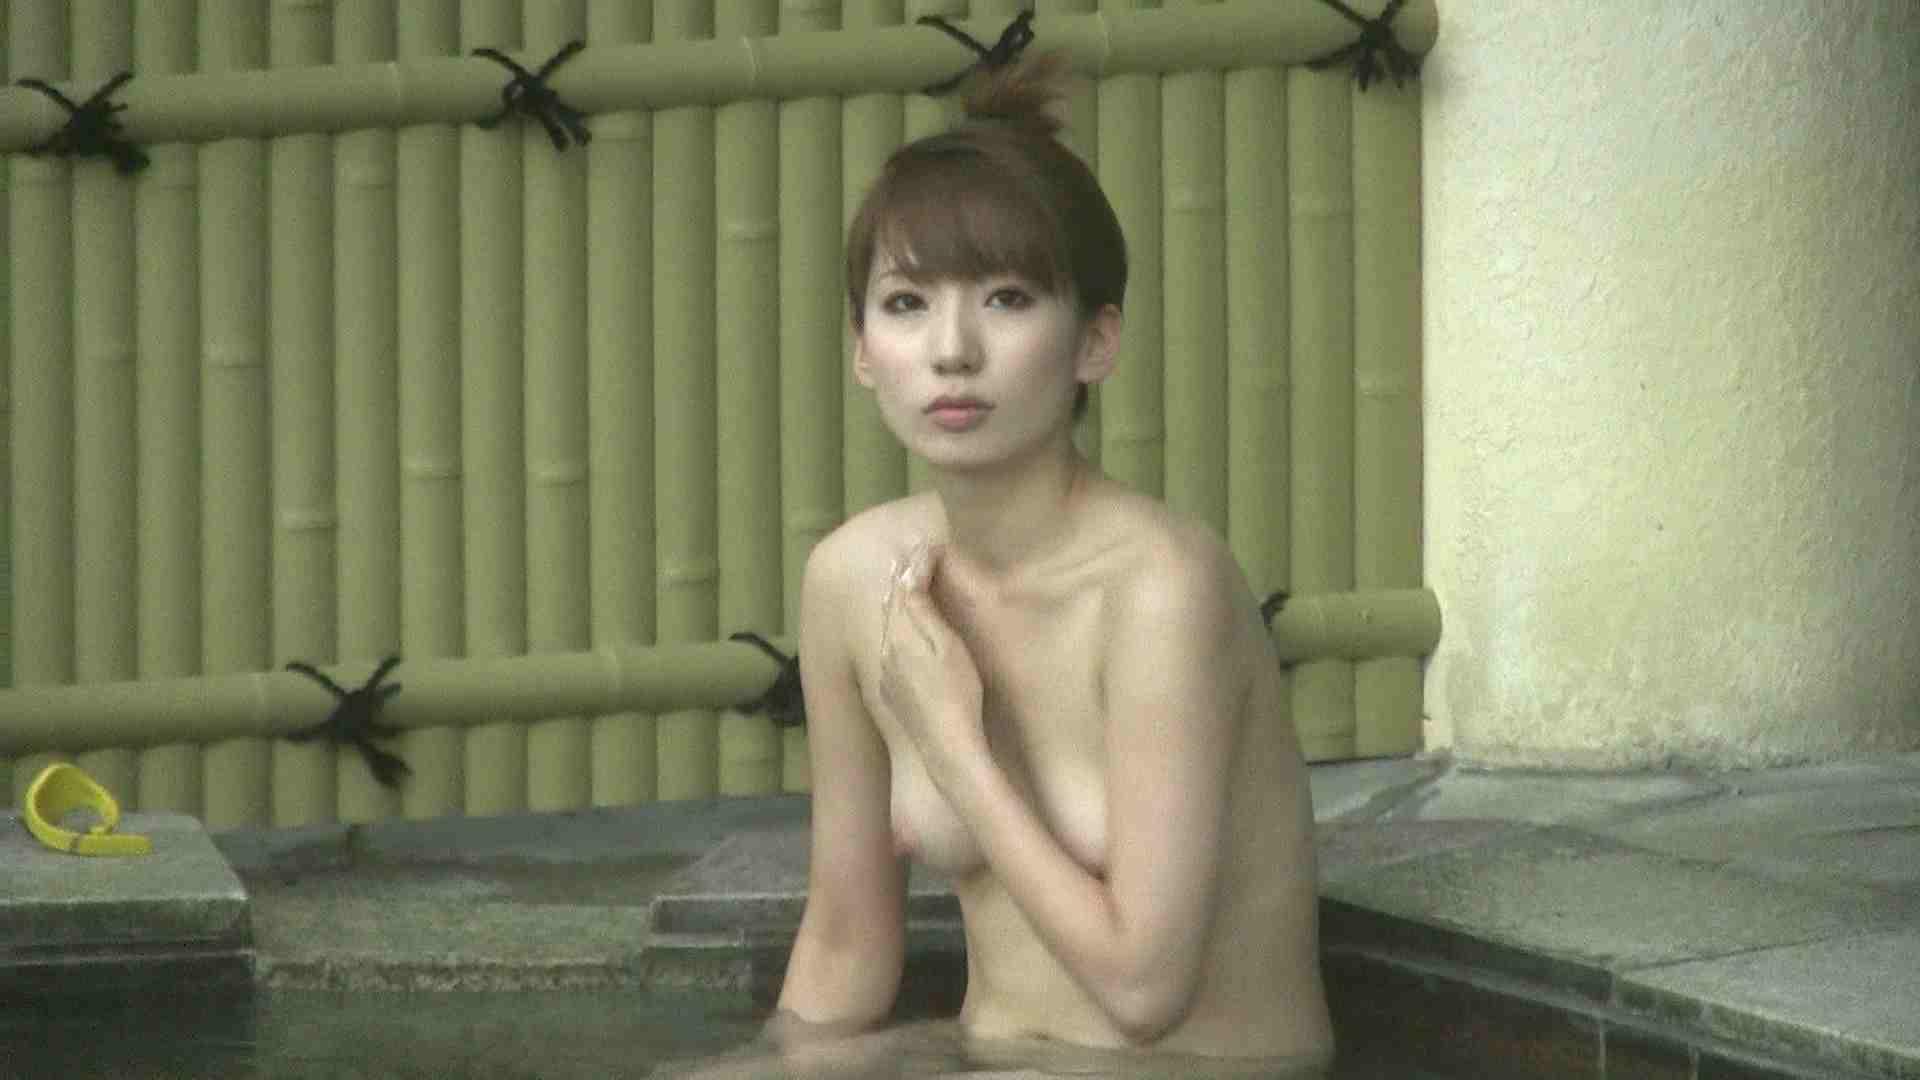 Aquaな露天風呂Vol.208 HなOL   盗撮  101pic 45